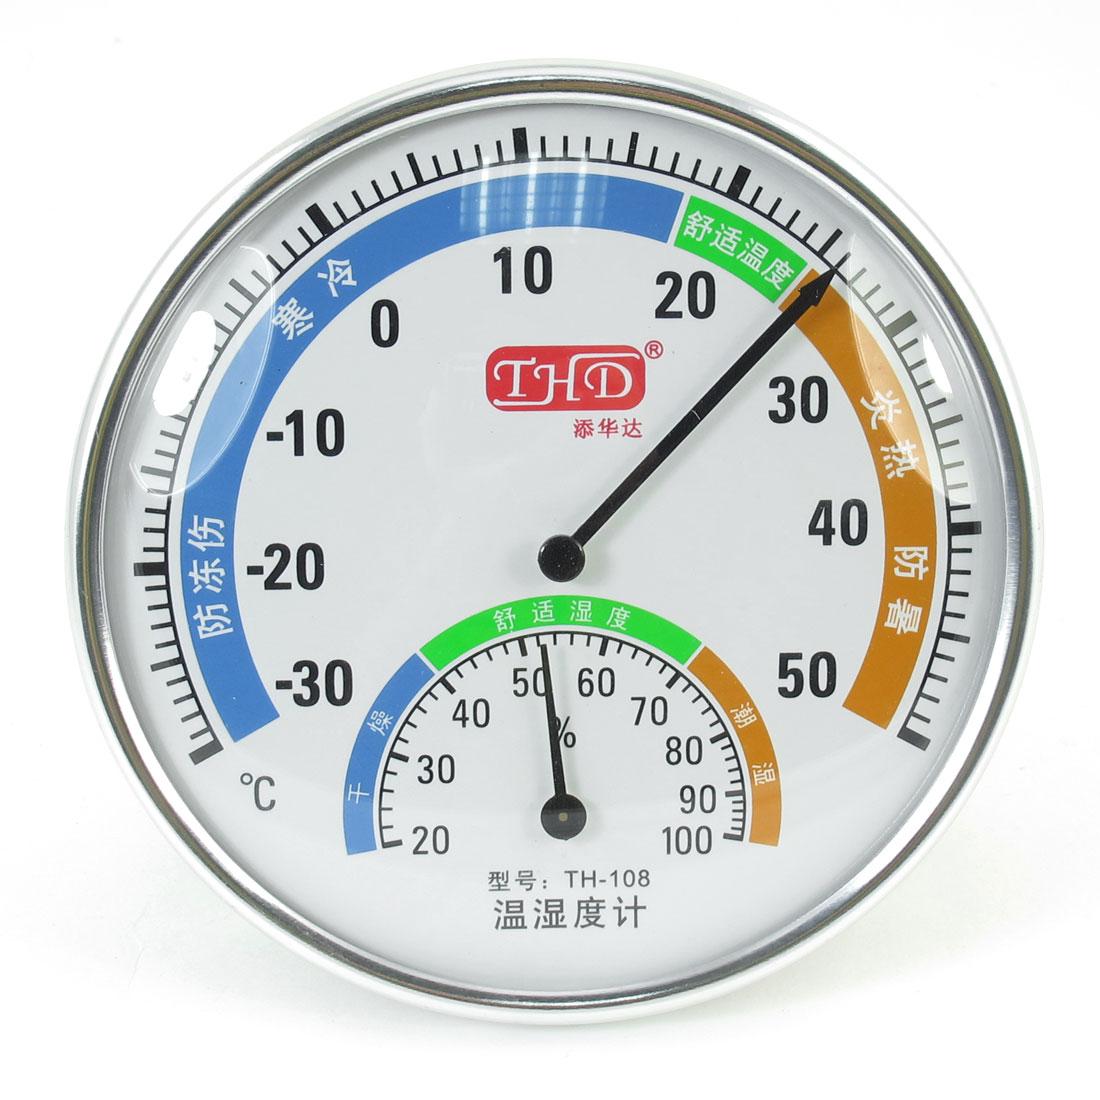 "Indoors White Plastic Housing 4.9"" Dia Round Dial Thermometer Hygrometer"